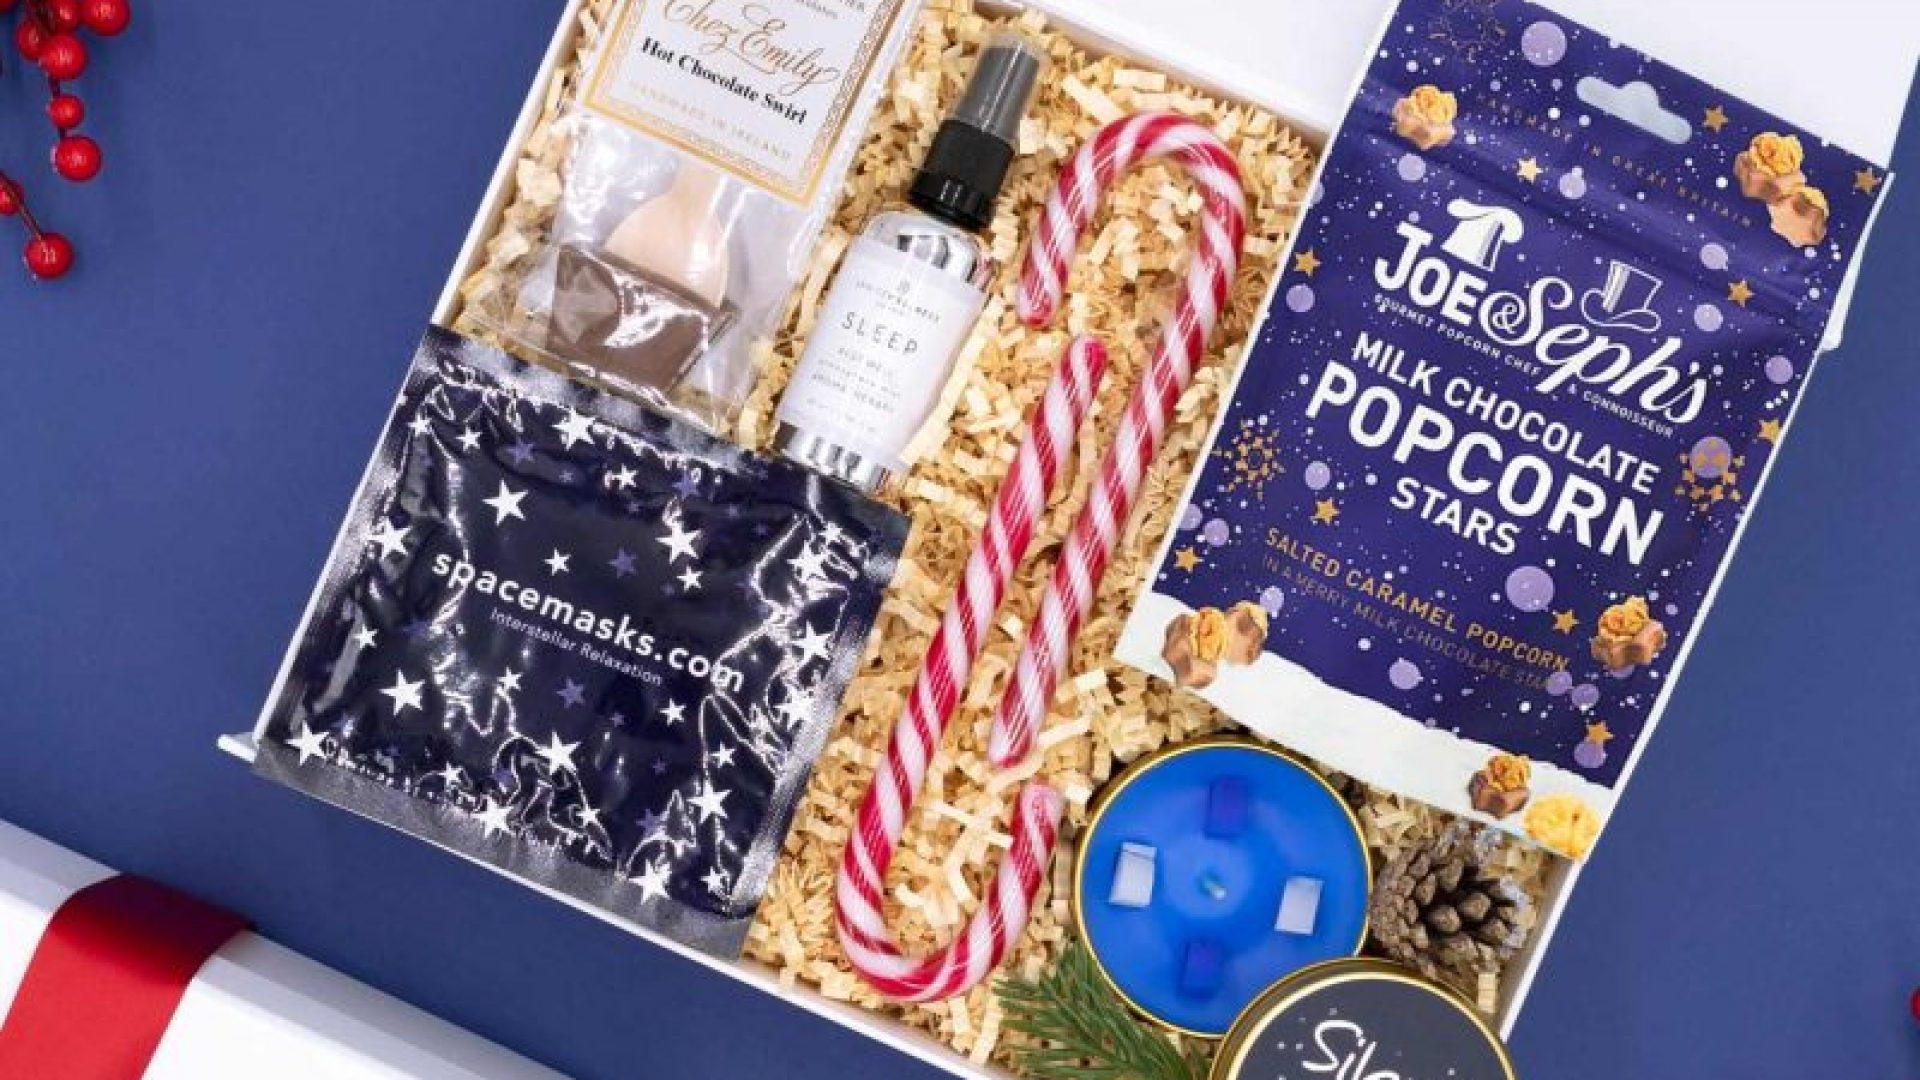 Twas-The-Night-Before-Christmas-Gift-Box-Vixi-Gifting-800x800-2